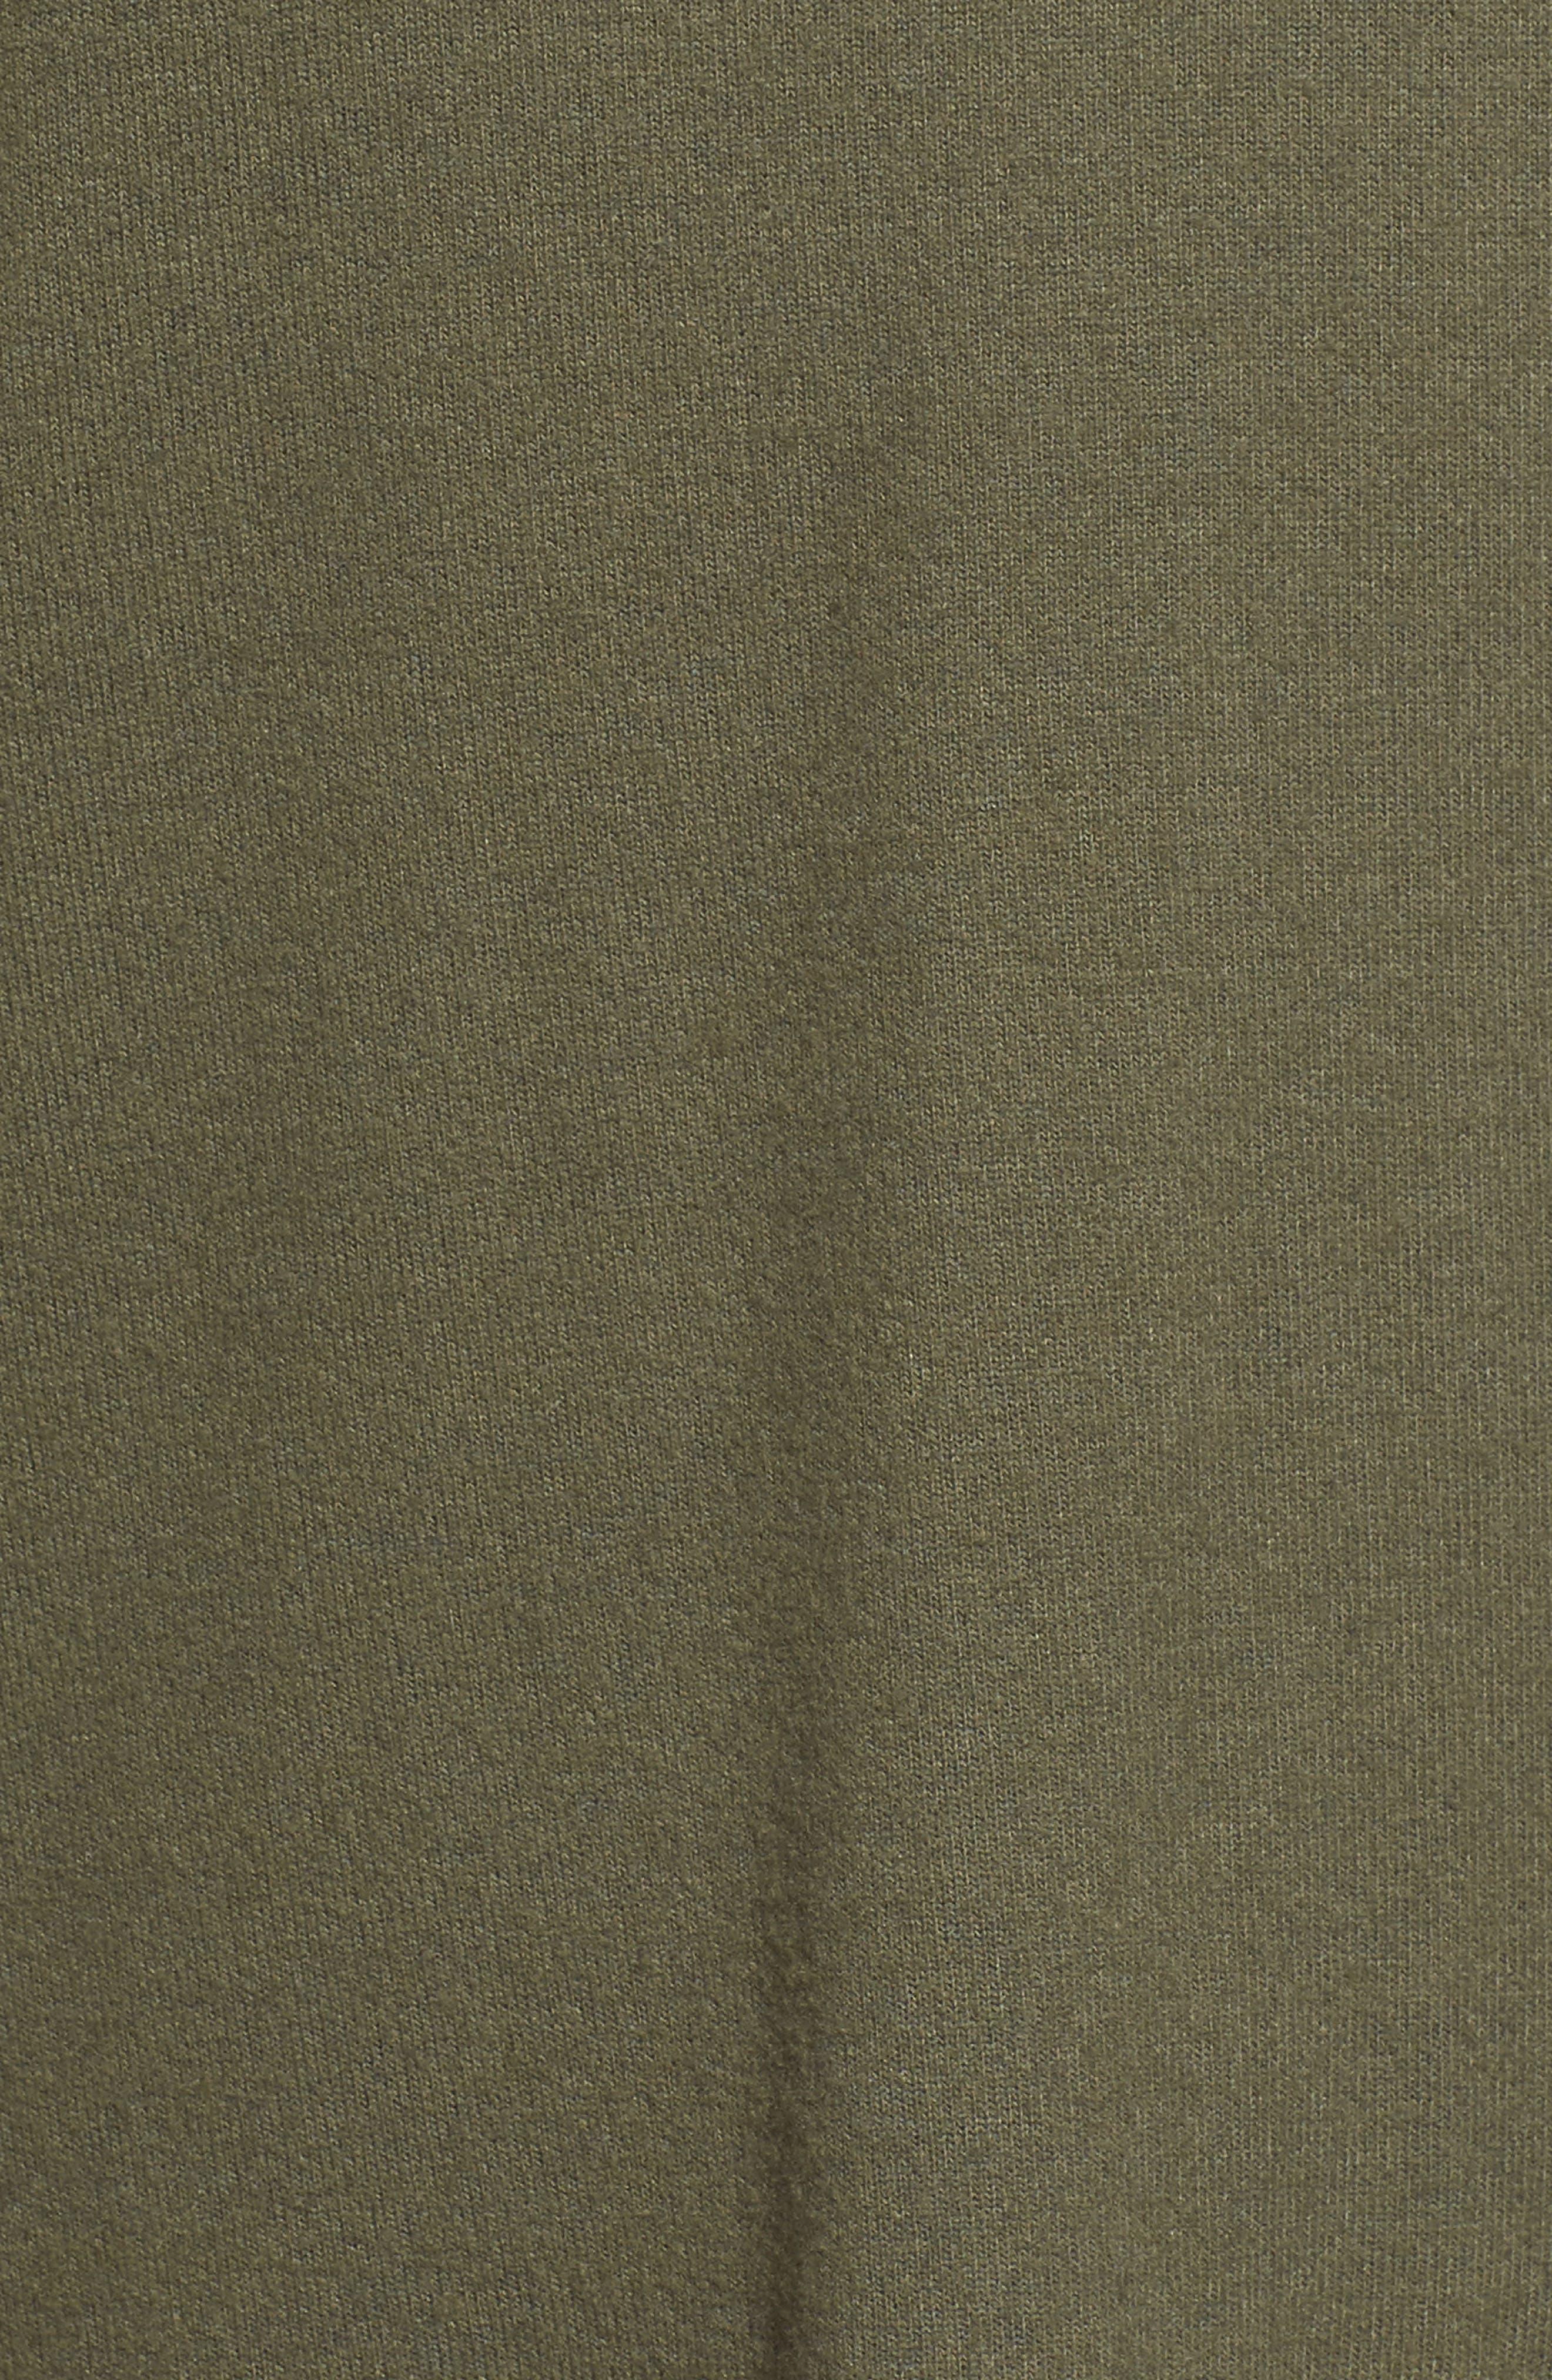 Bell Sleeve Cozy Fleece Pullover,                             Alternate thumbnail 56, color,